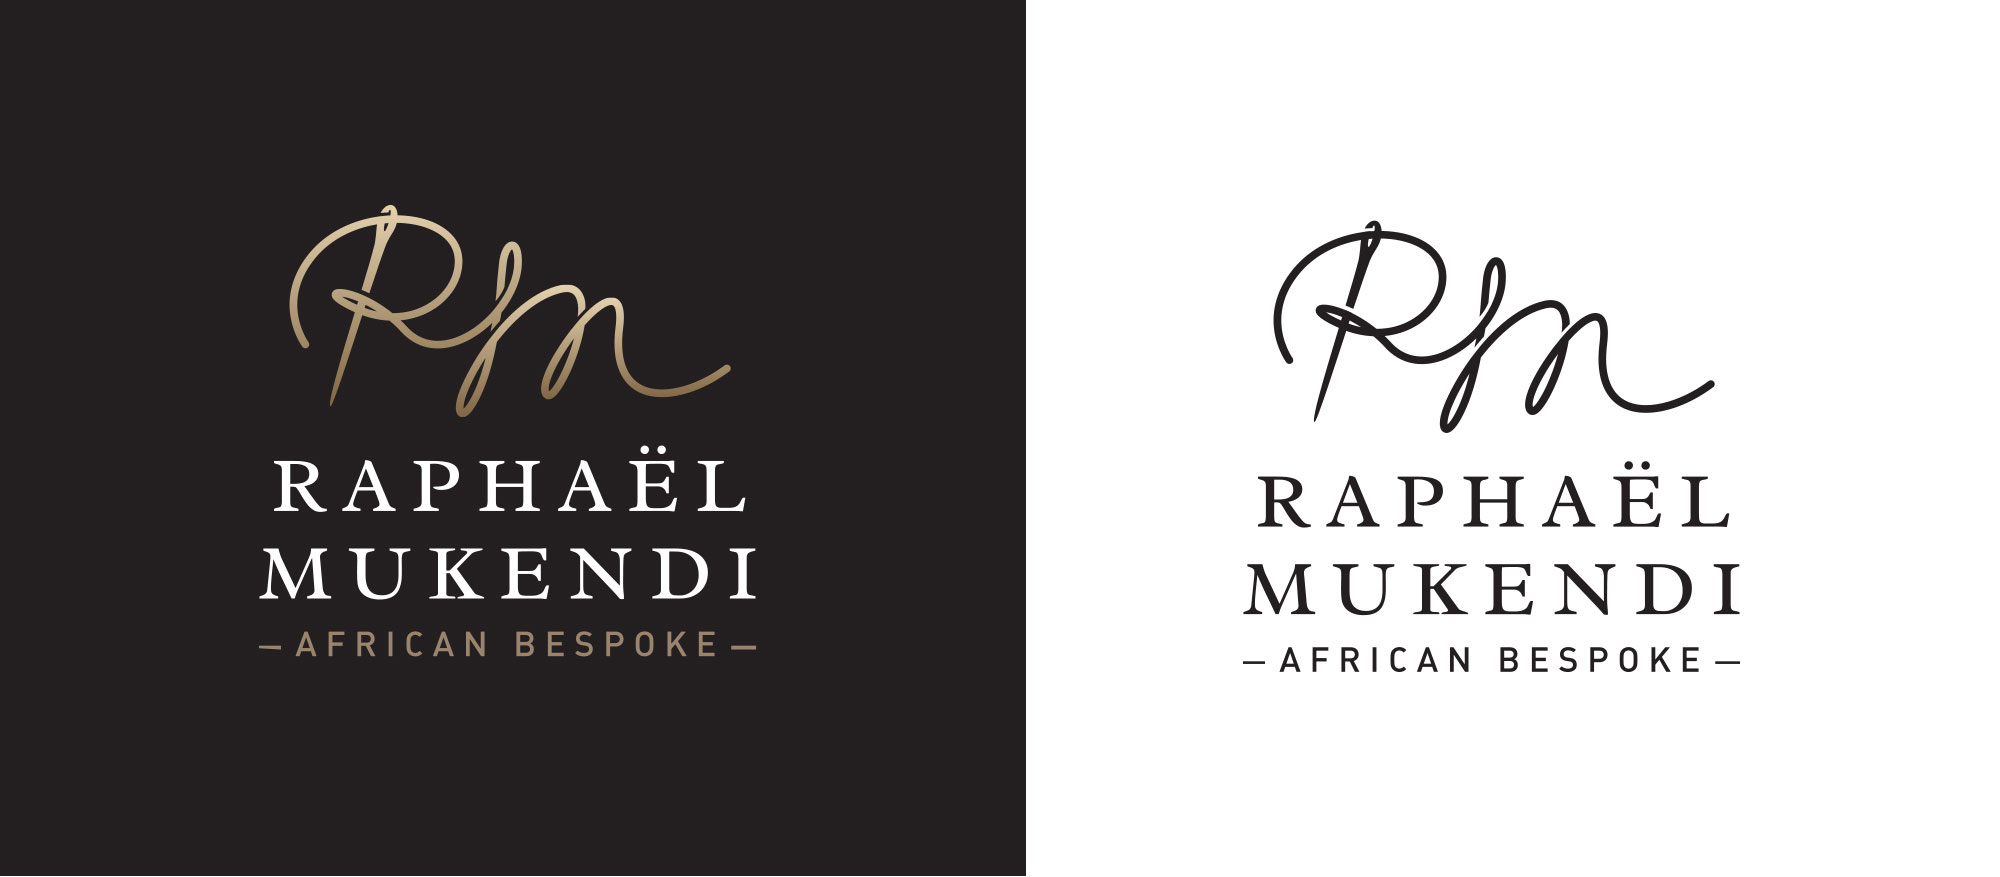 case study high fashion logo design raph228el mukendi